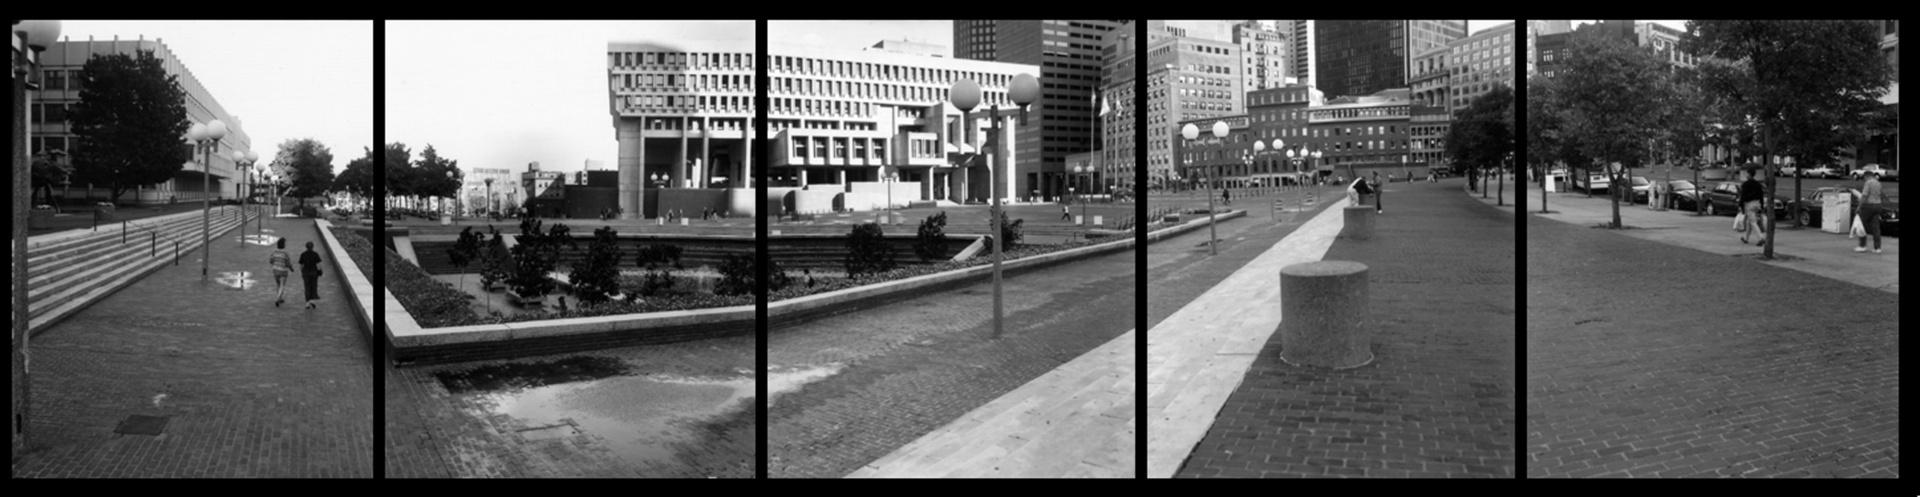 Plaza10-5-97.jpg